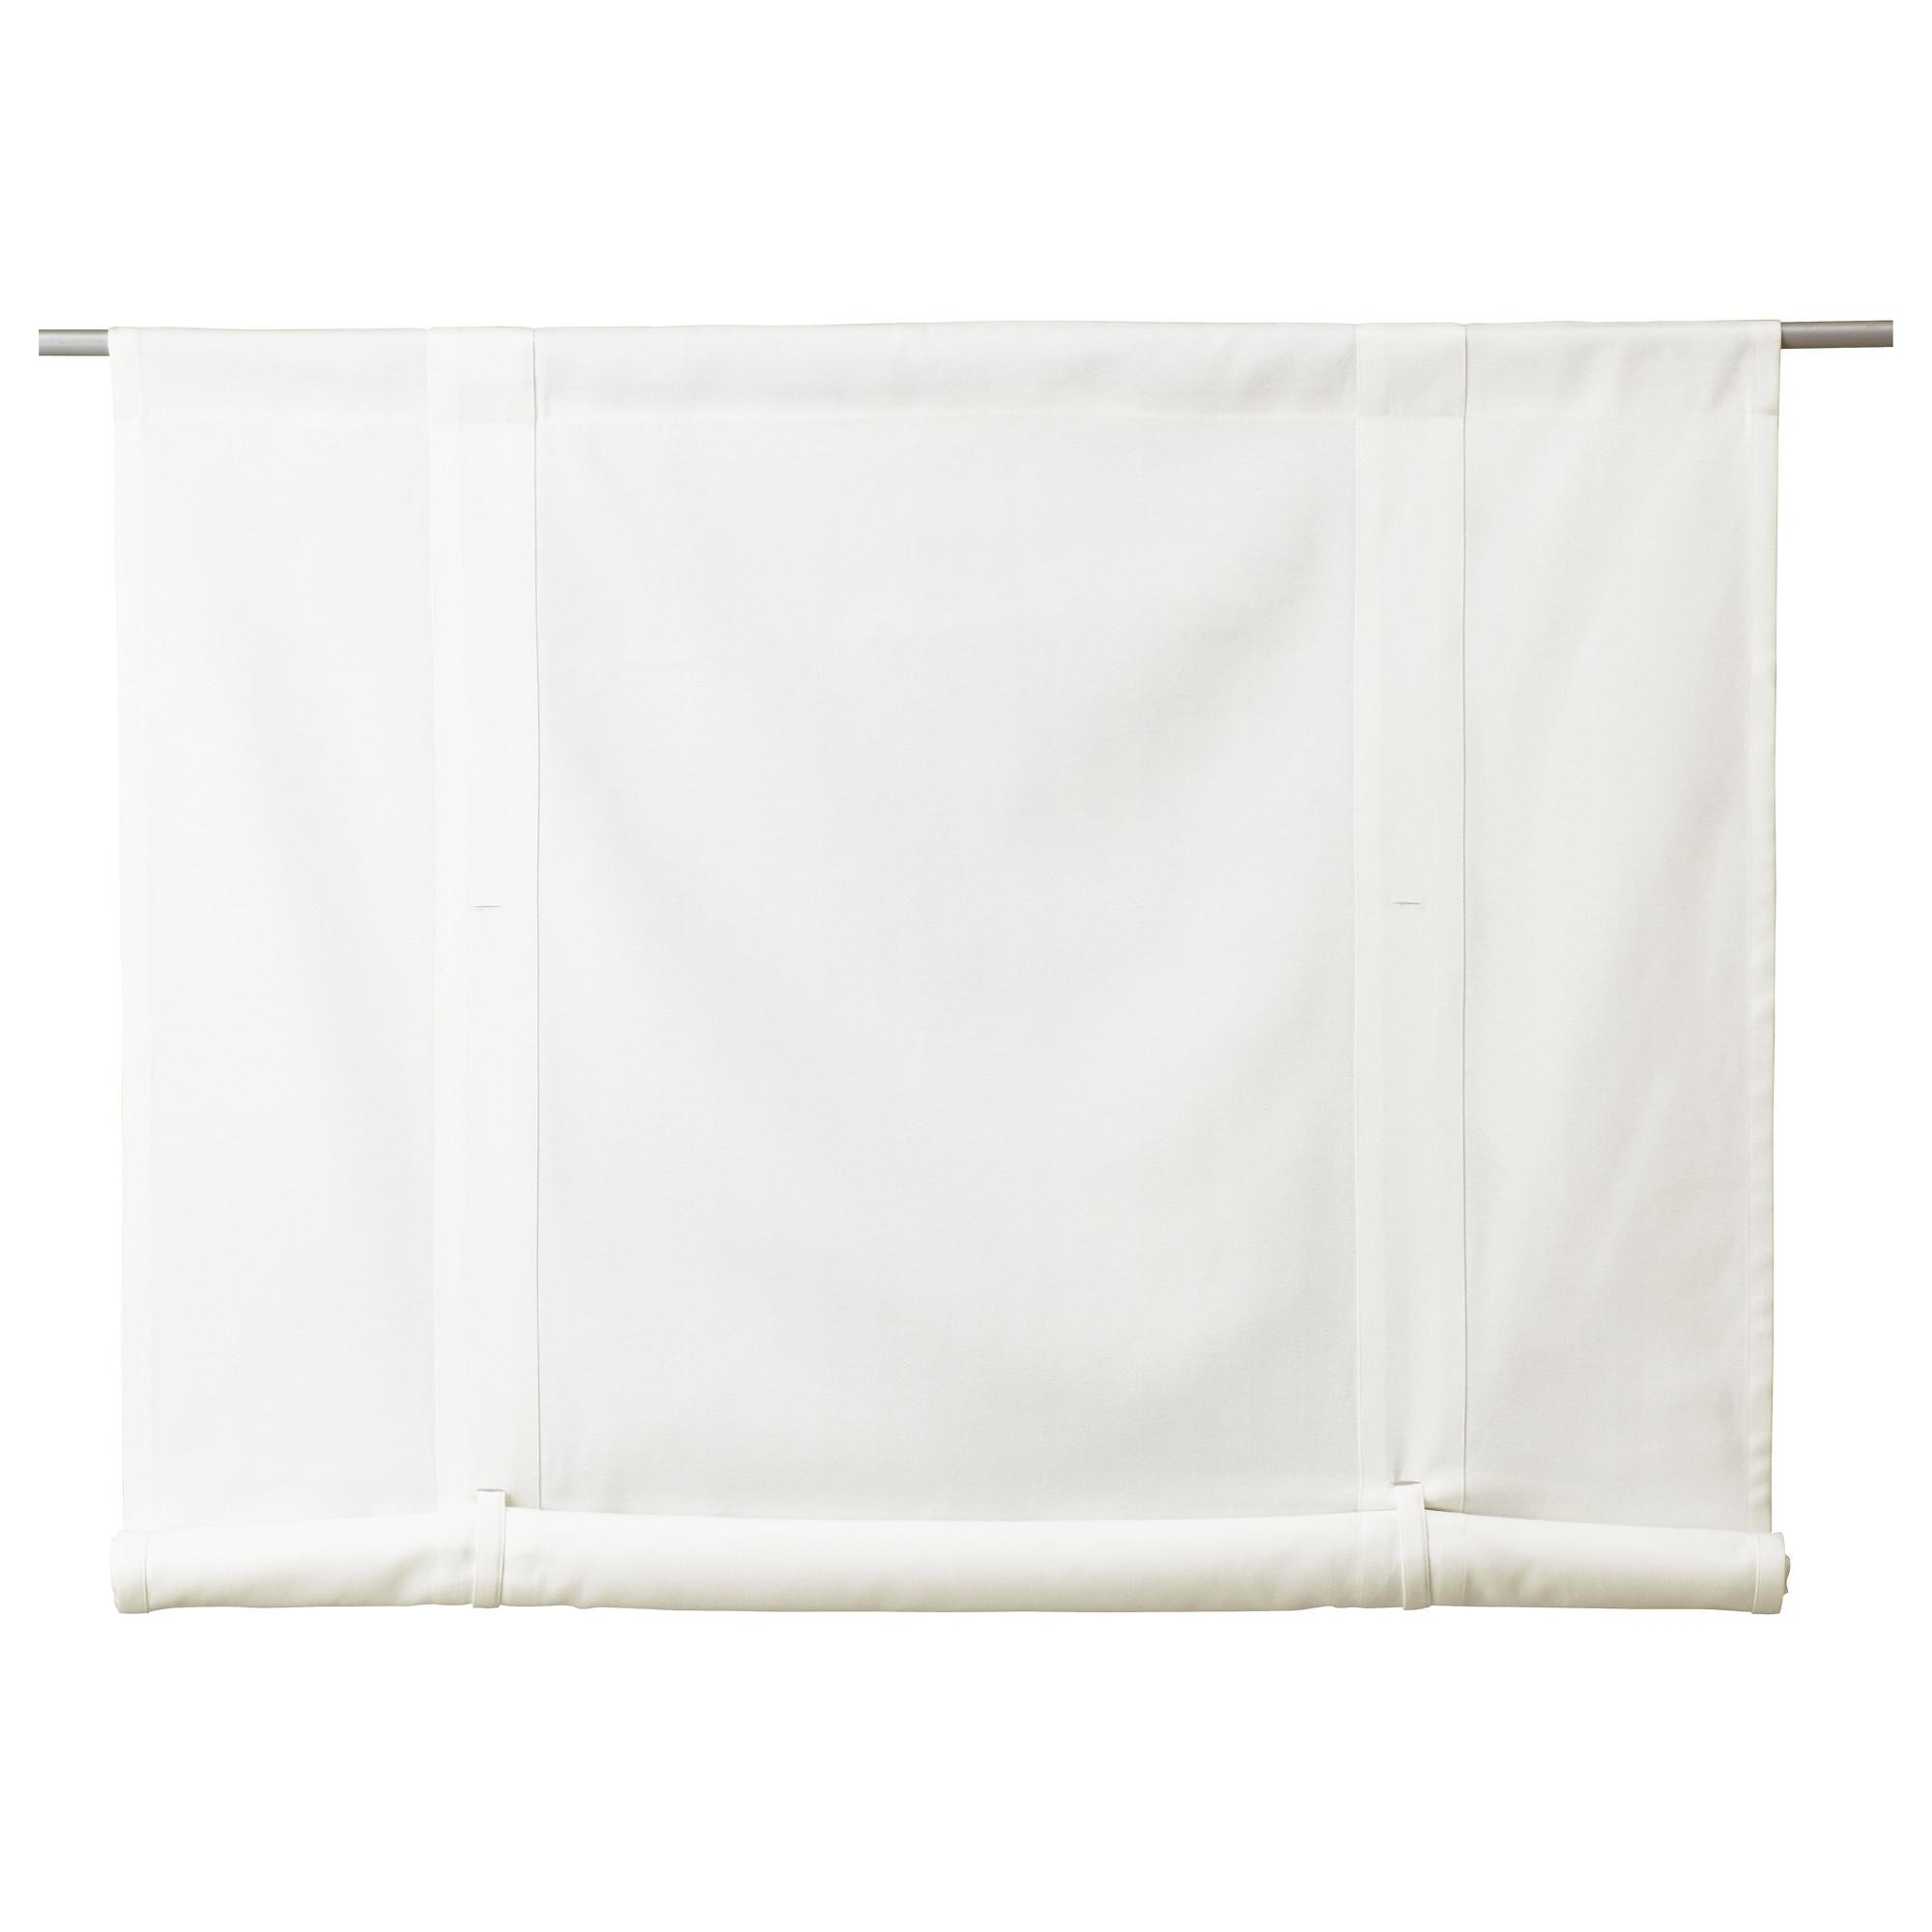 Ikea ibiza detalles producto - Sabanas 180 ikea ...